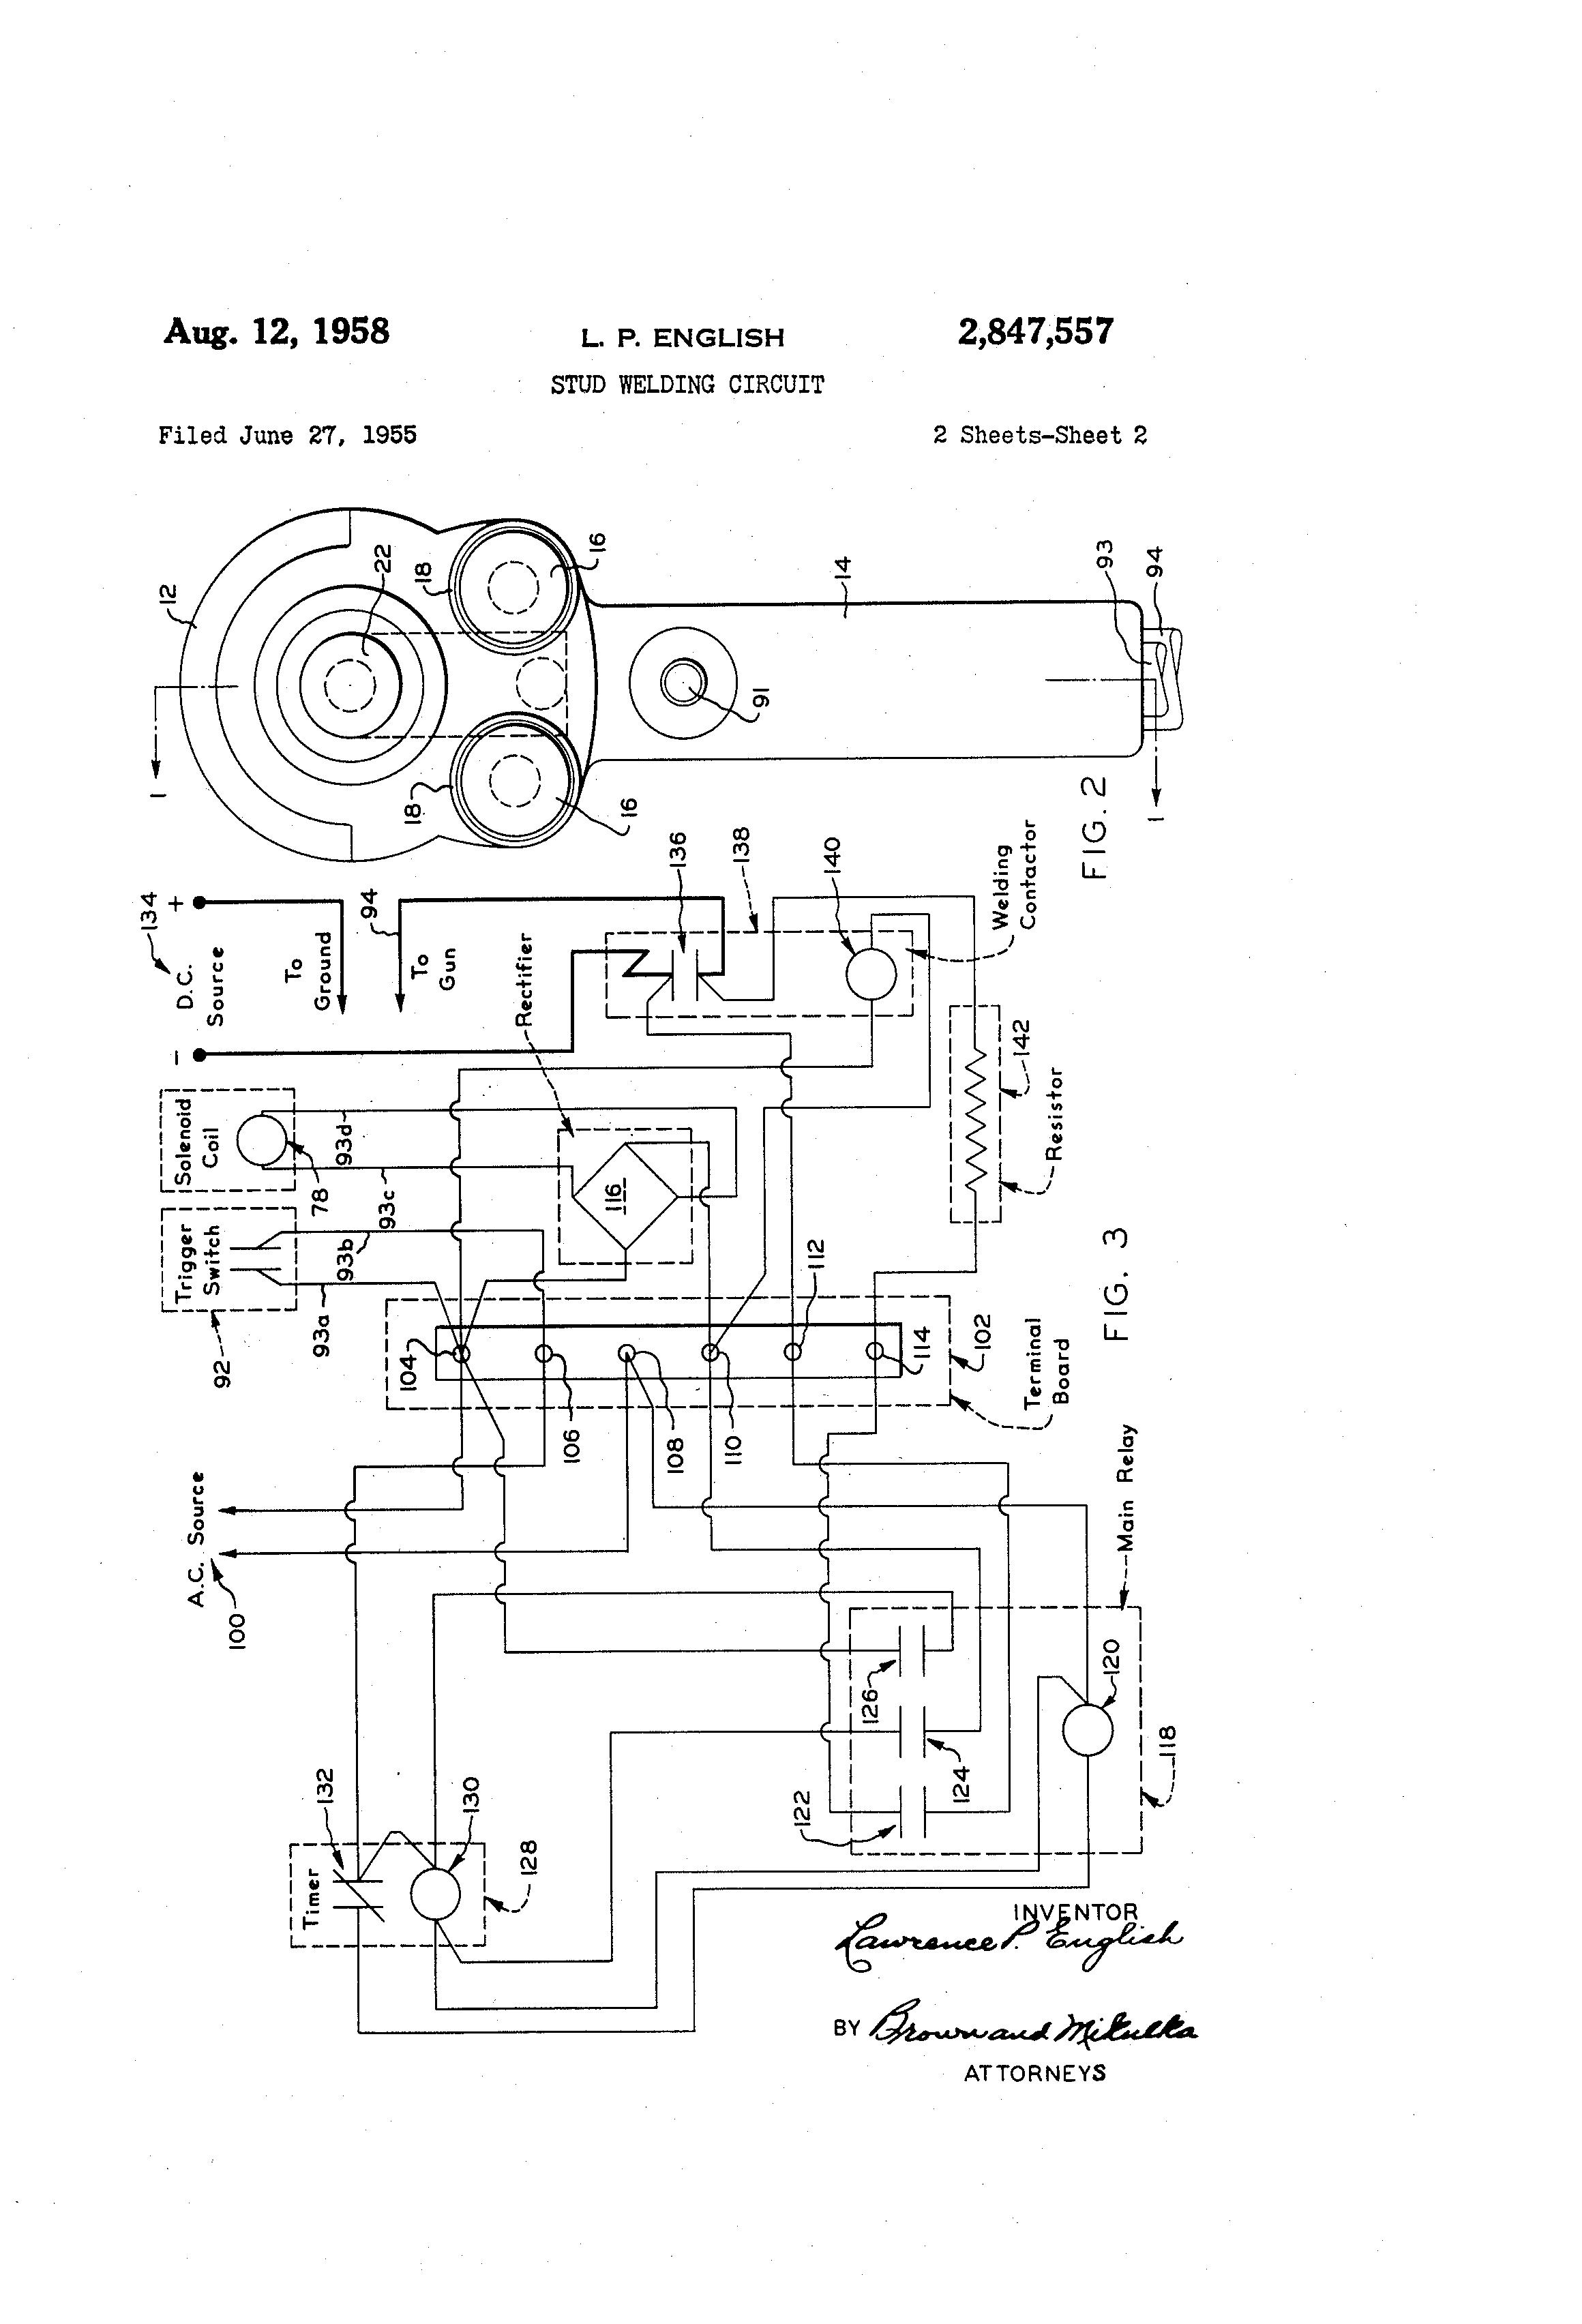 patent us2847557 - stud welding circuit